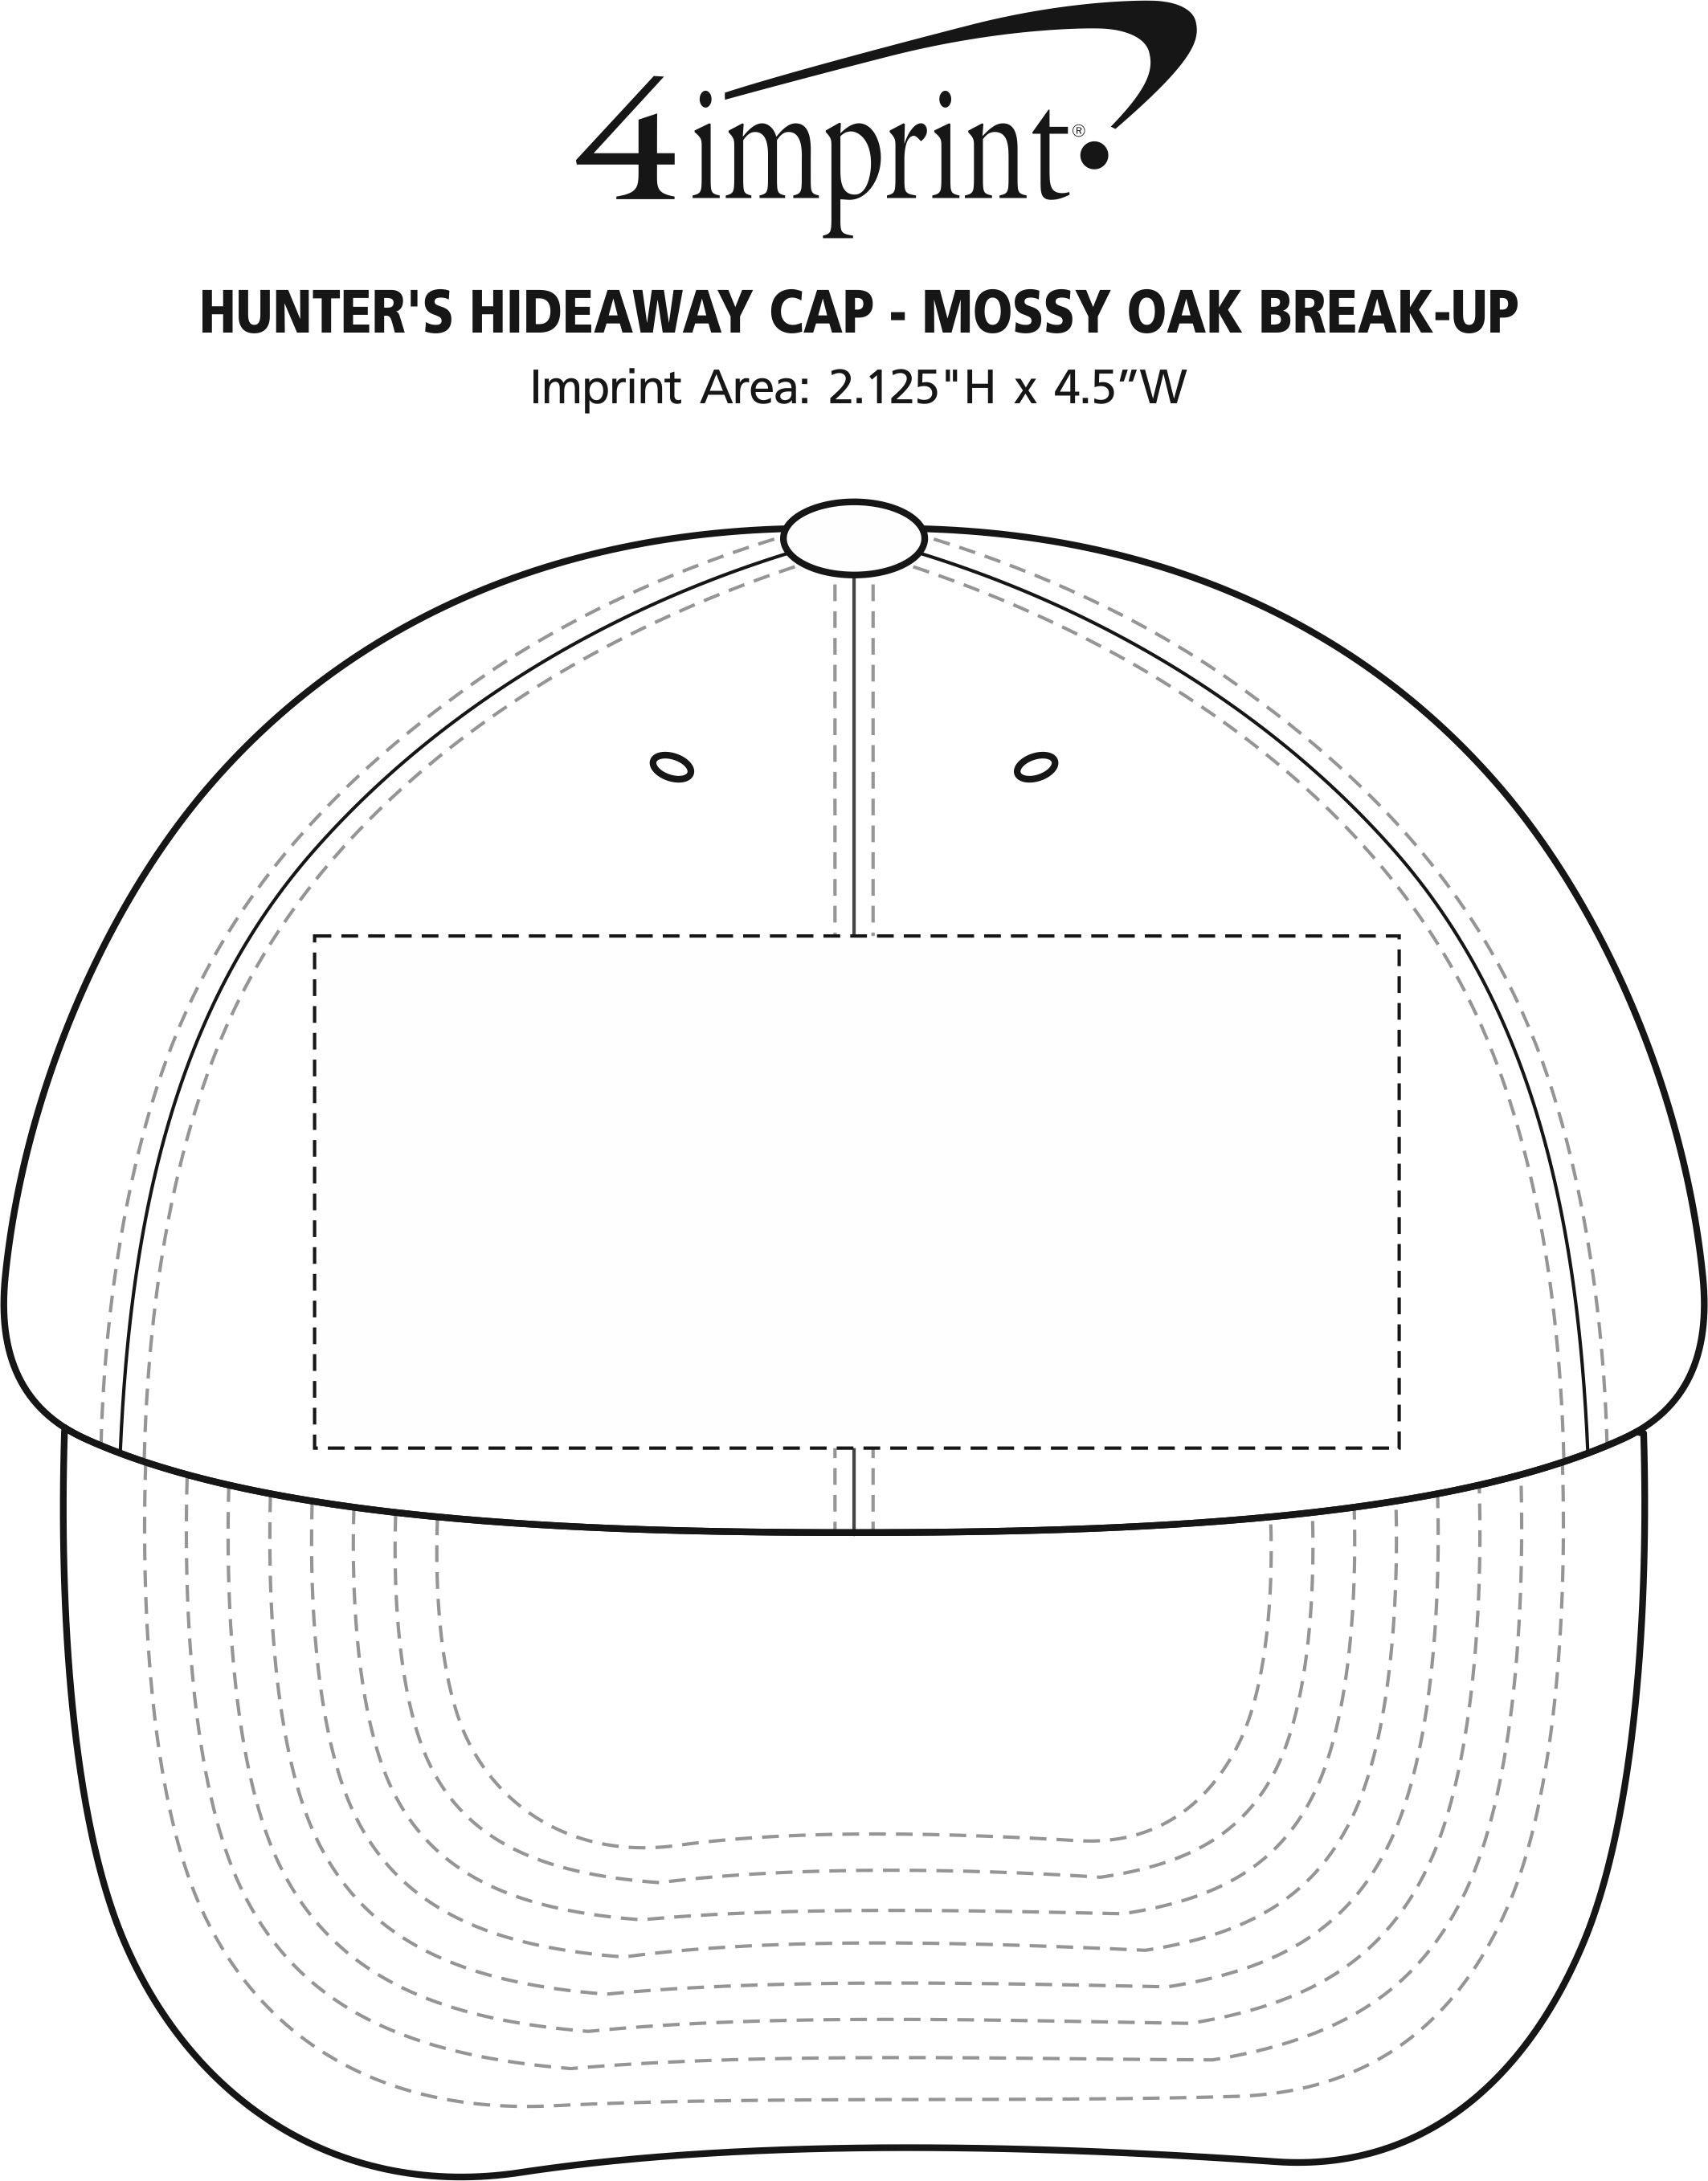 Imprint Area of Hunter's Hideaway Cap - Mossy Oak Break-Up